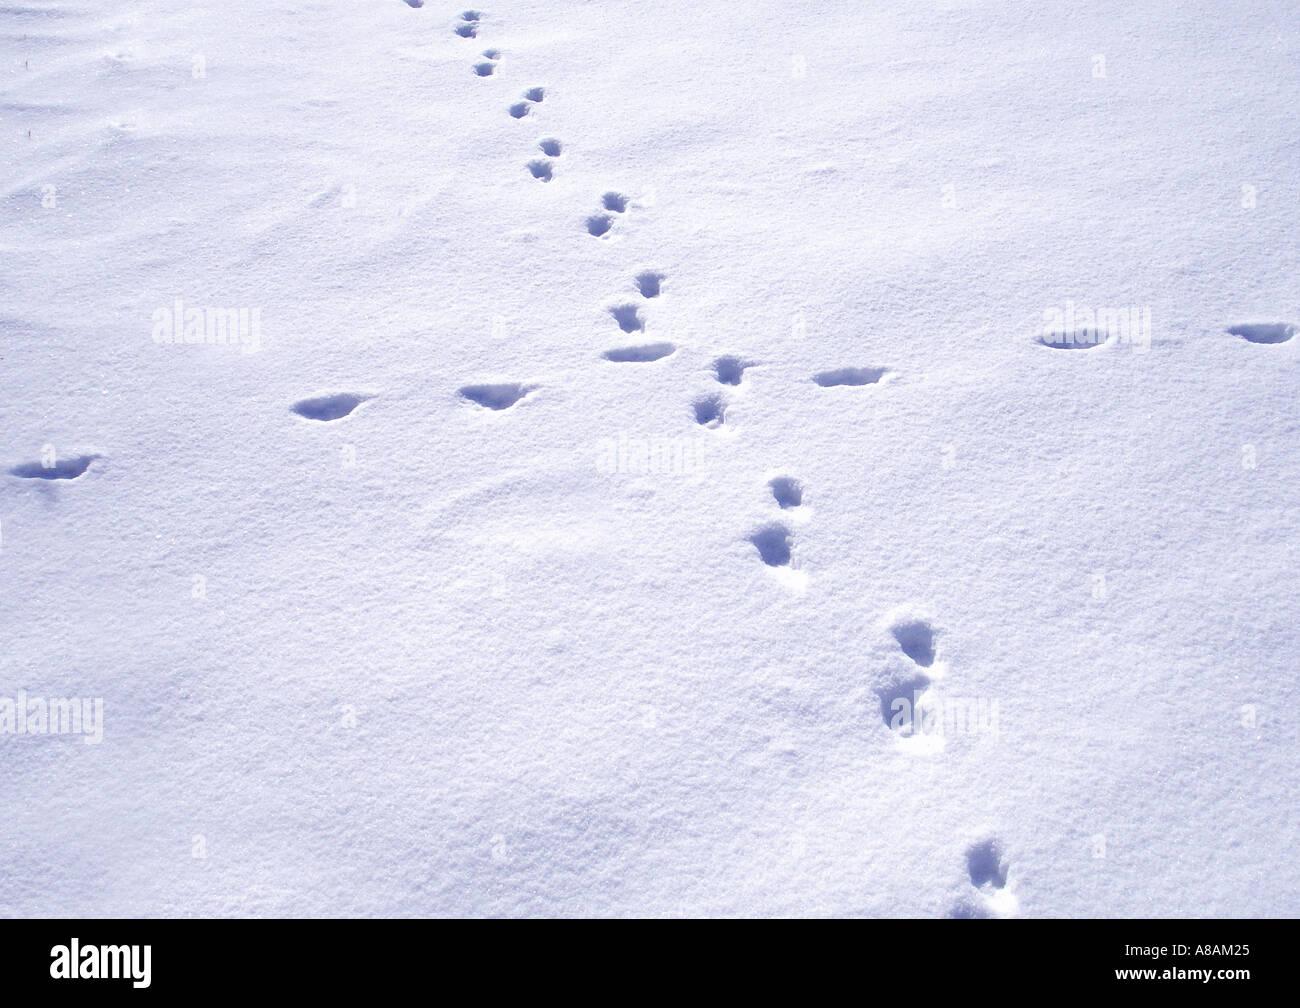 animal footprints in the snow tierspuren im schnee stock photo royalty free image 3931172 alamy. Black Bedroom Furniture Sets. Home Design Ideas